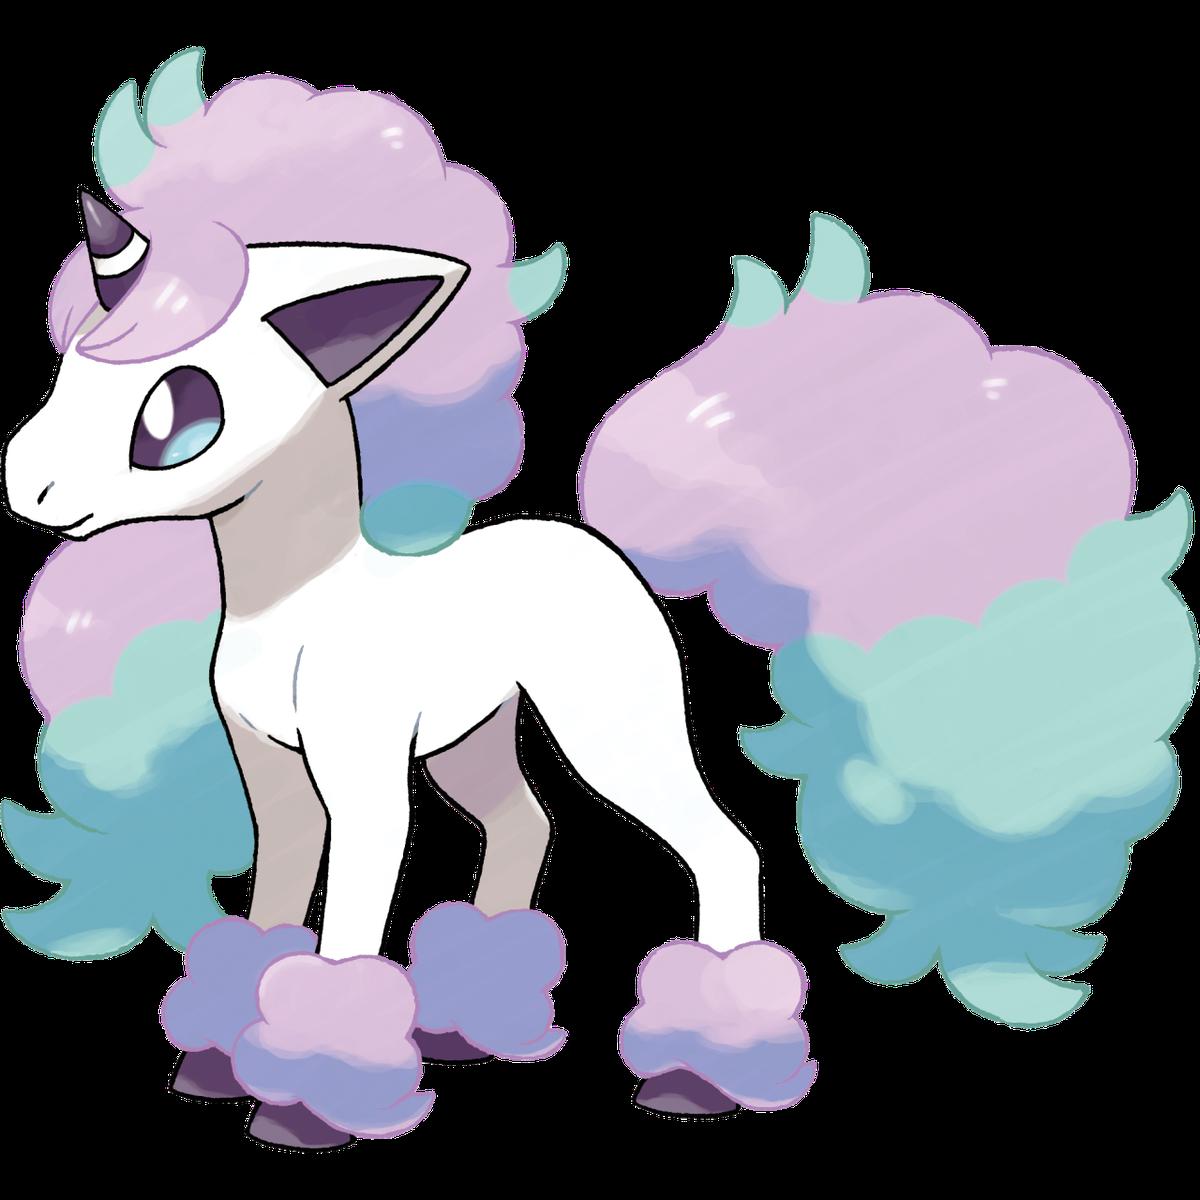 Galarian Ponyta is exclusive to Pokémon Shield